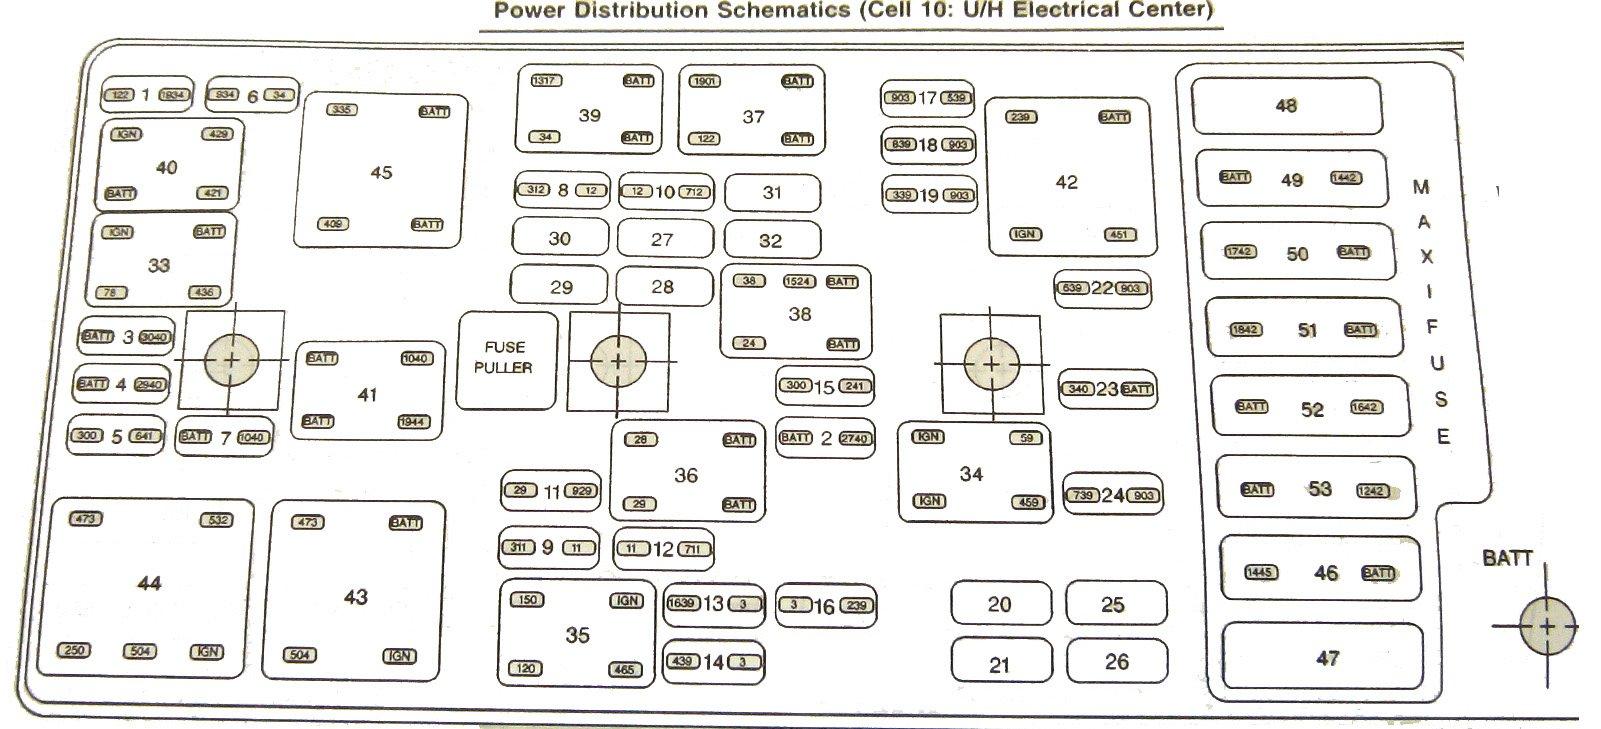 1998 Corvette Fuse Diagram Wiring Diagrams Note Unity Note Unity Mumblestudio It